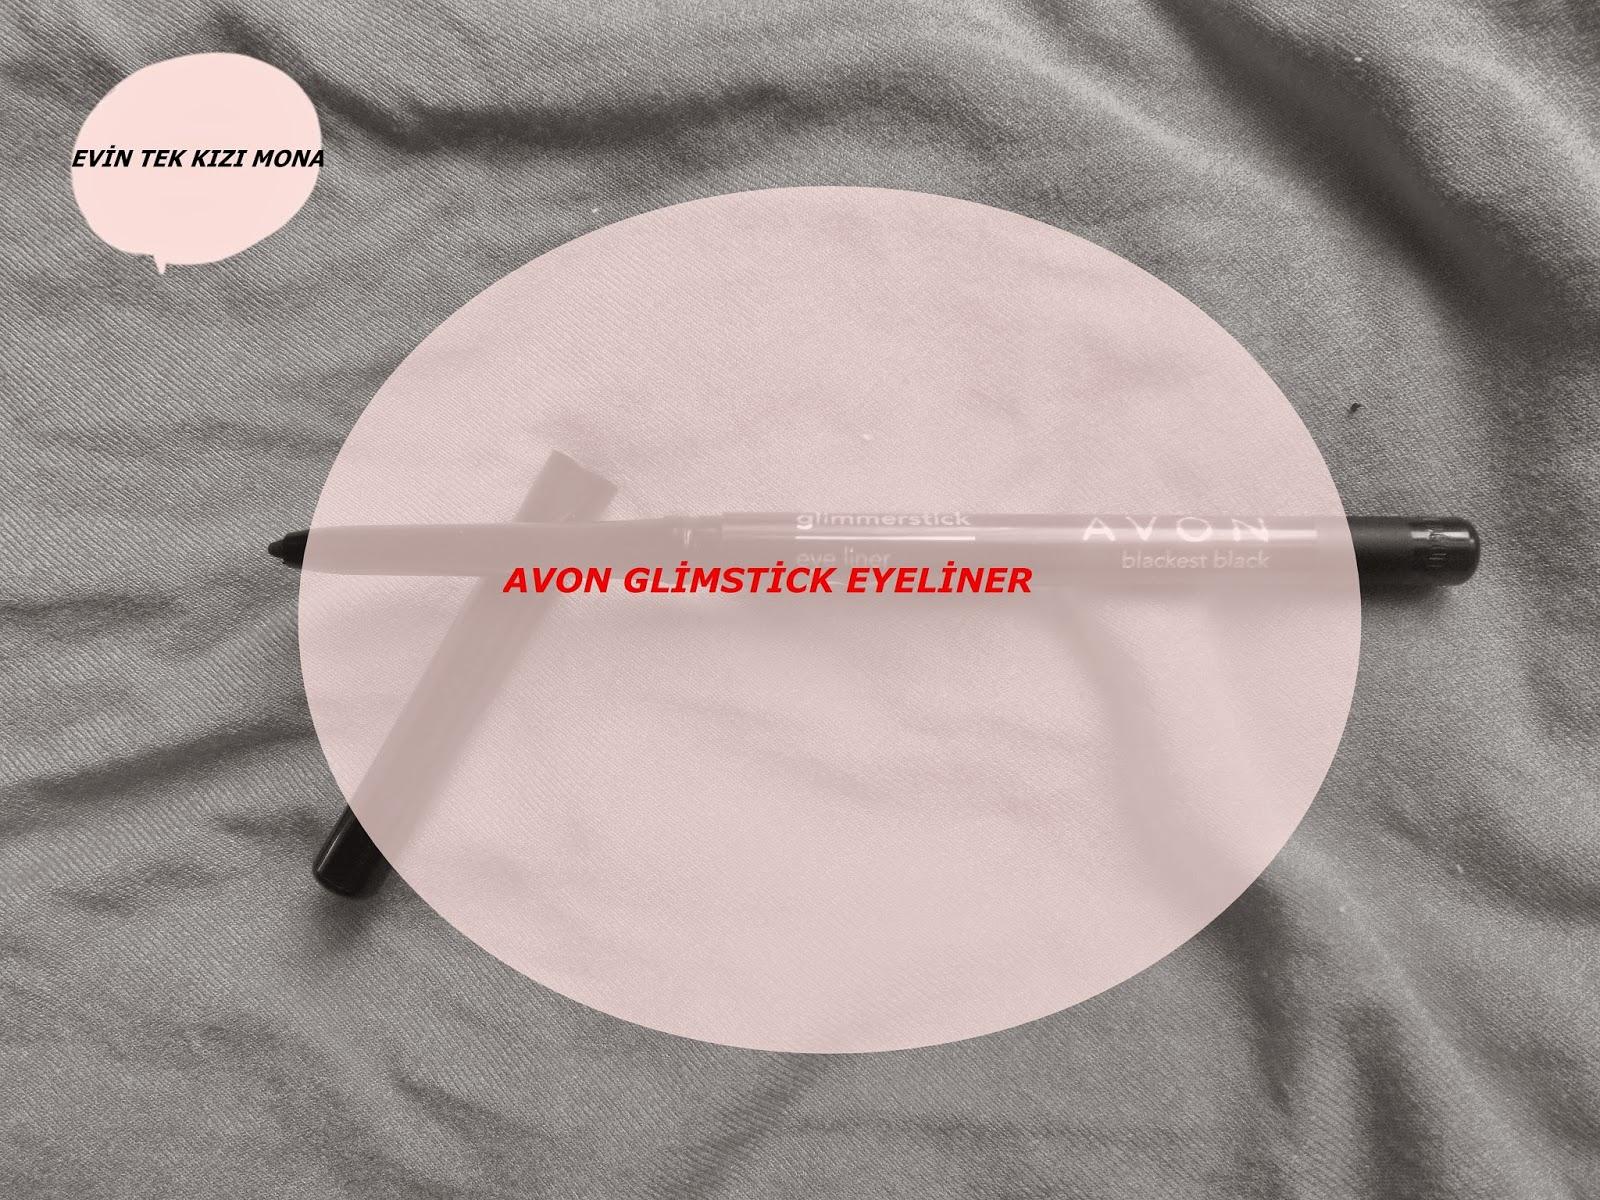 avon eye liner